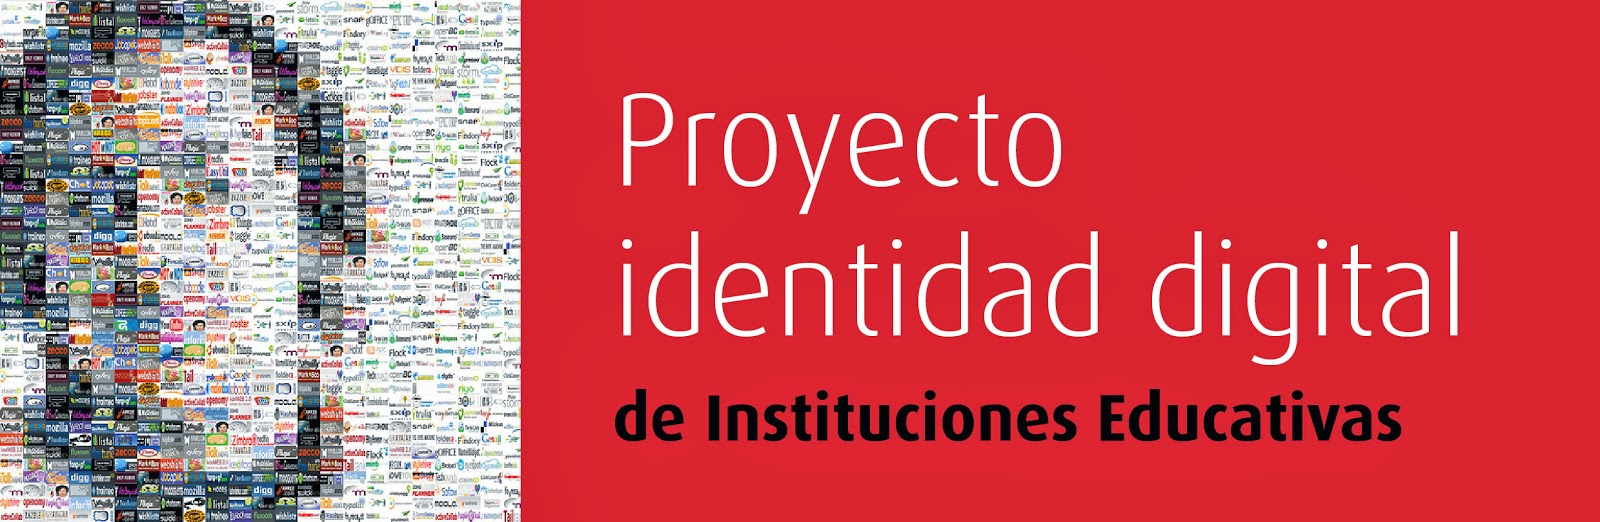 fuentes de la imagen: http://es.scribd.com/doc/206913948/Proyecto-Identidad-Digital-de-Instituciones-Educativas?secret_password=1fm5mcwr2psvnsovhpgx